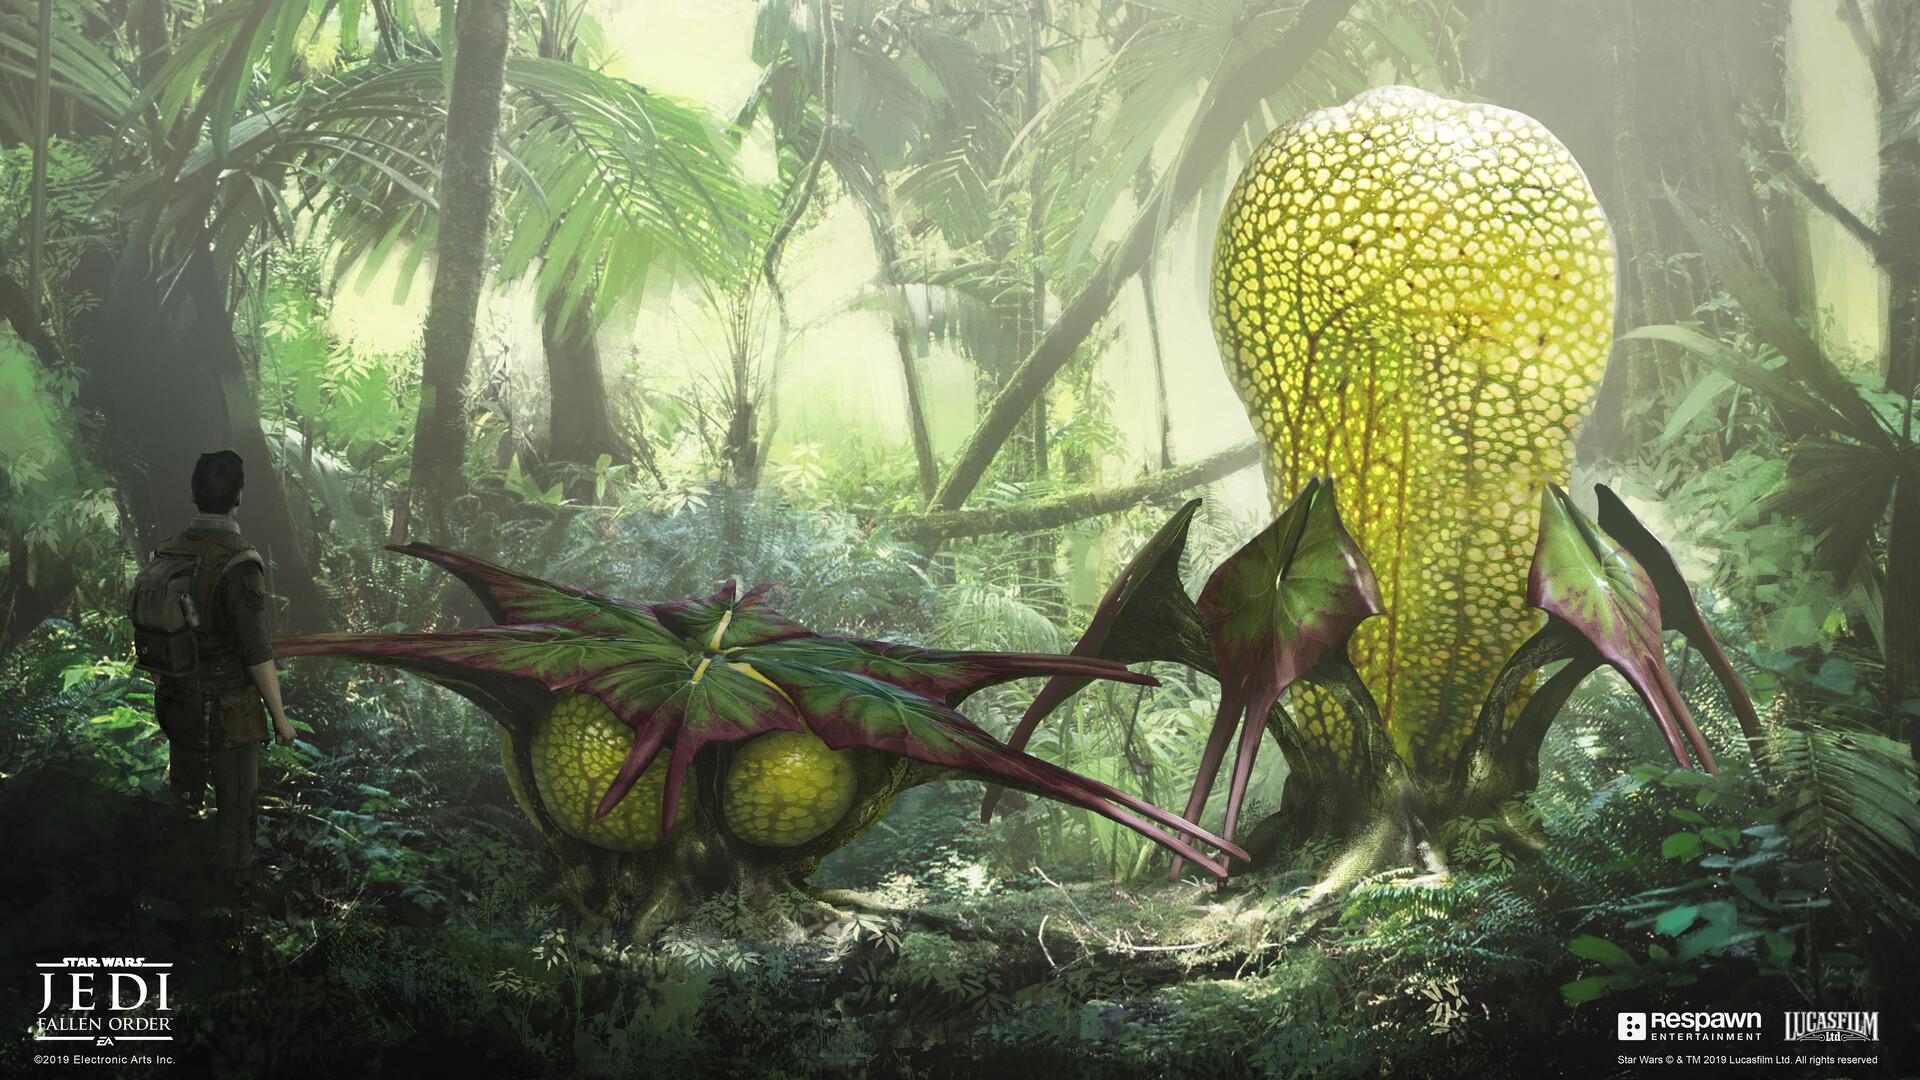 jean-francois-rey-lung-plant.jpg?1580010